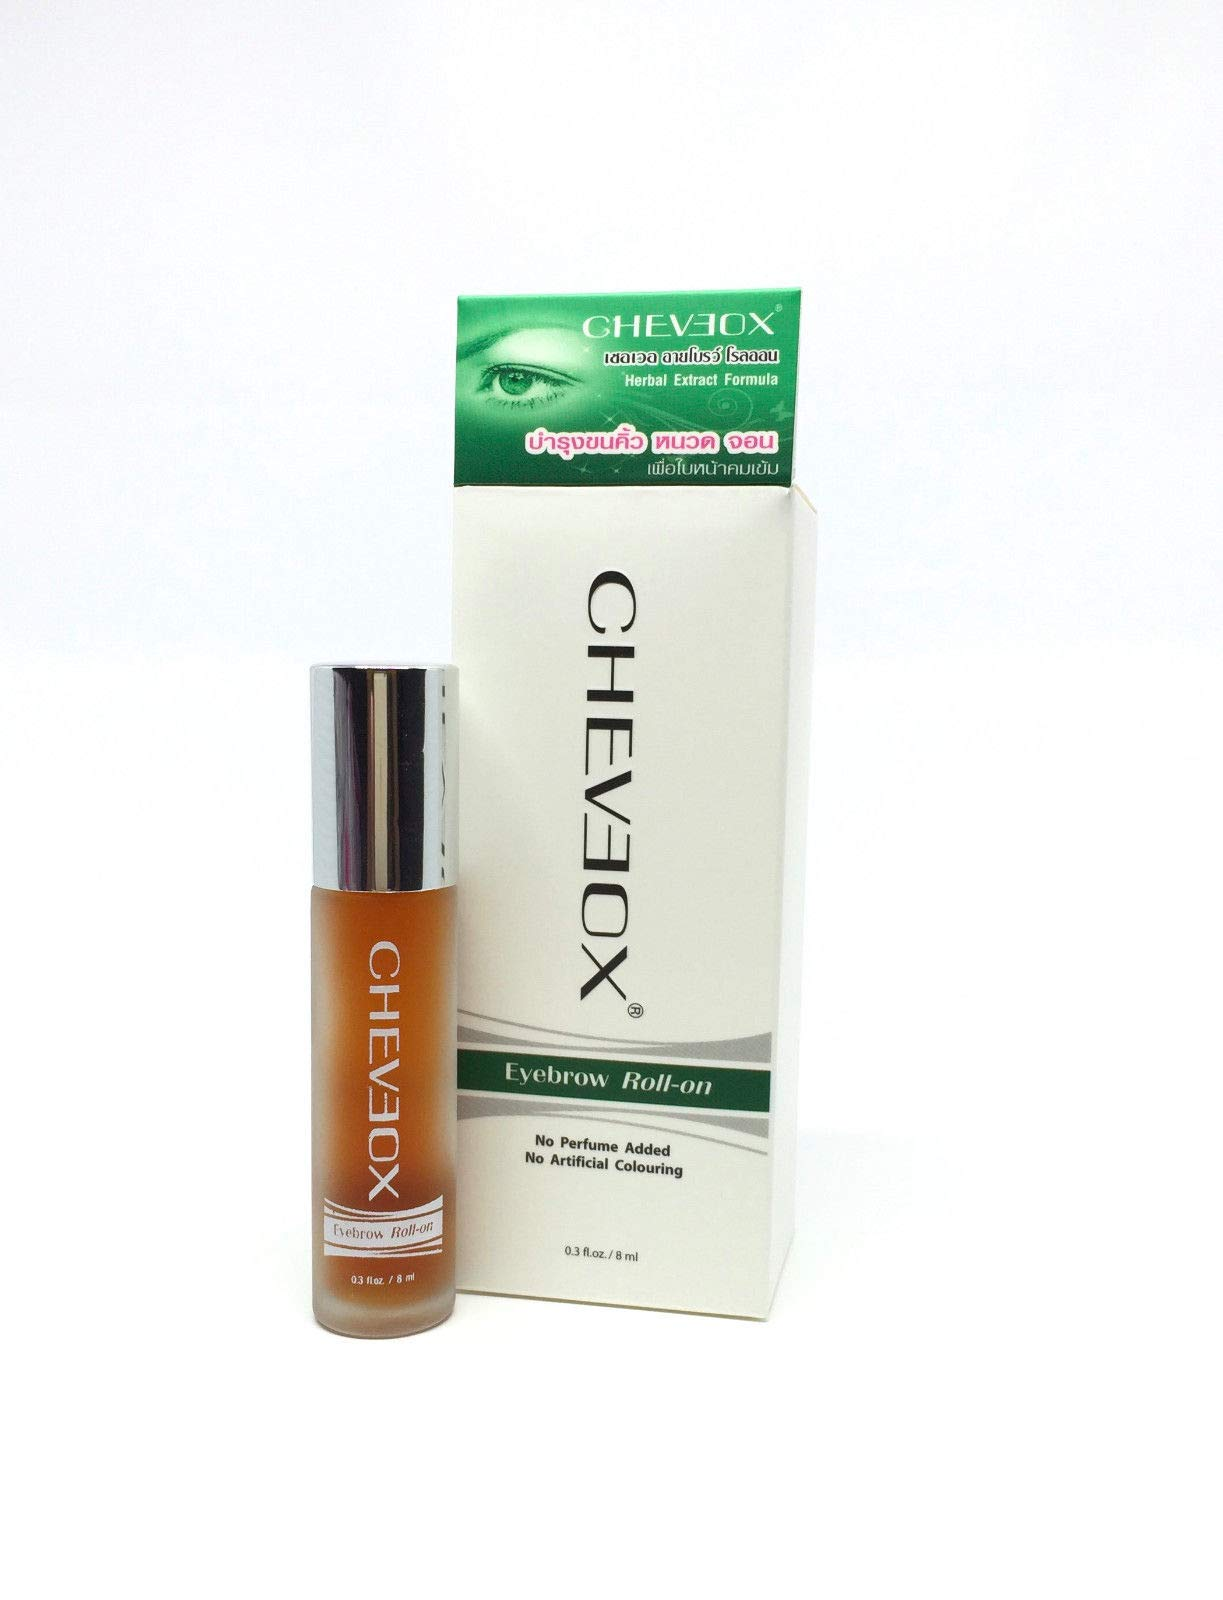 CHEVEOX Eyebrow Roll-on Rapid Grow Facial Hair Mustache Beard Eyebrows Sideburns by Cheveox